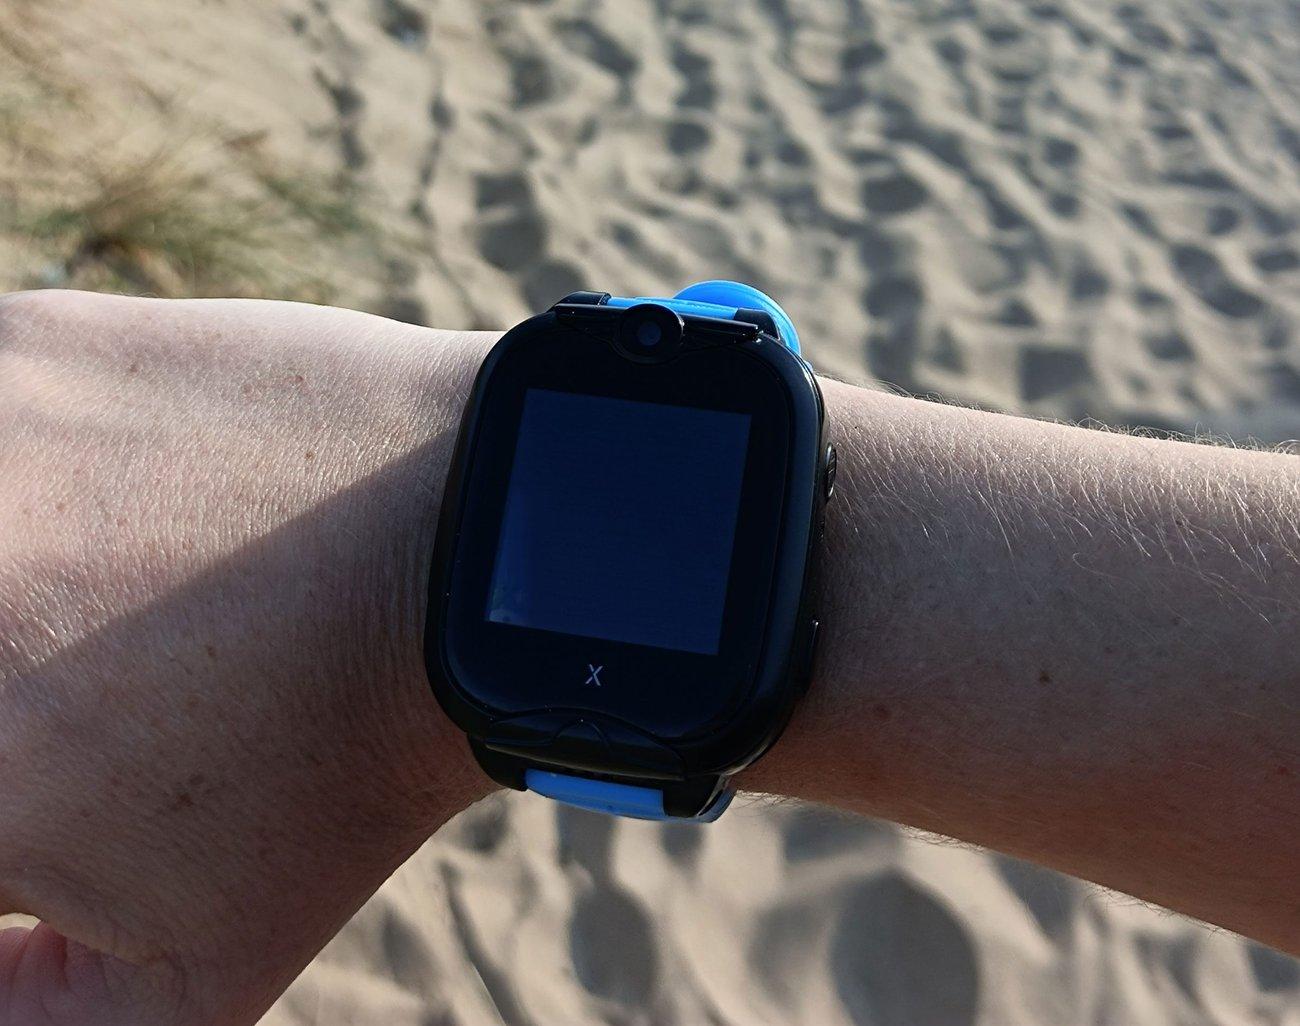 Xplora Smartwatch am Strand